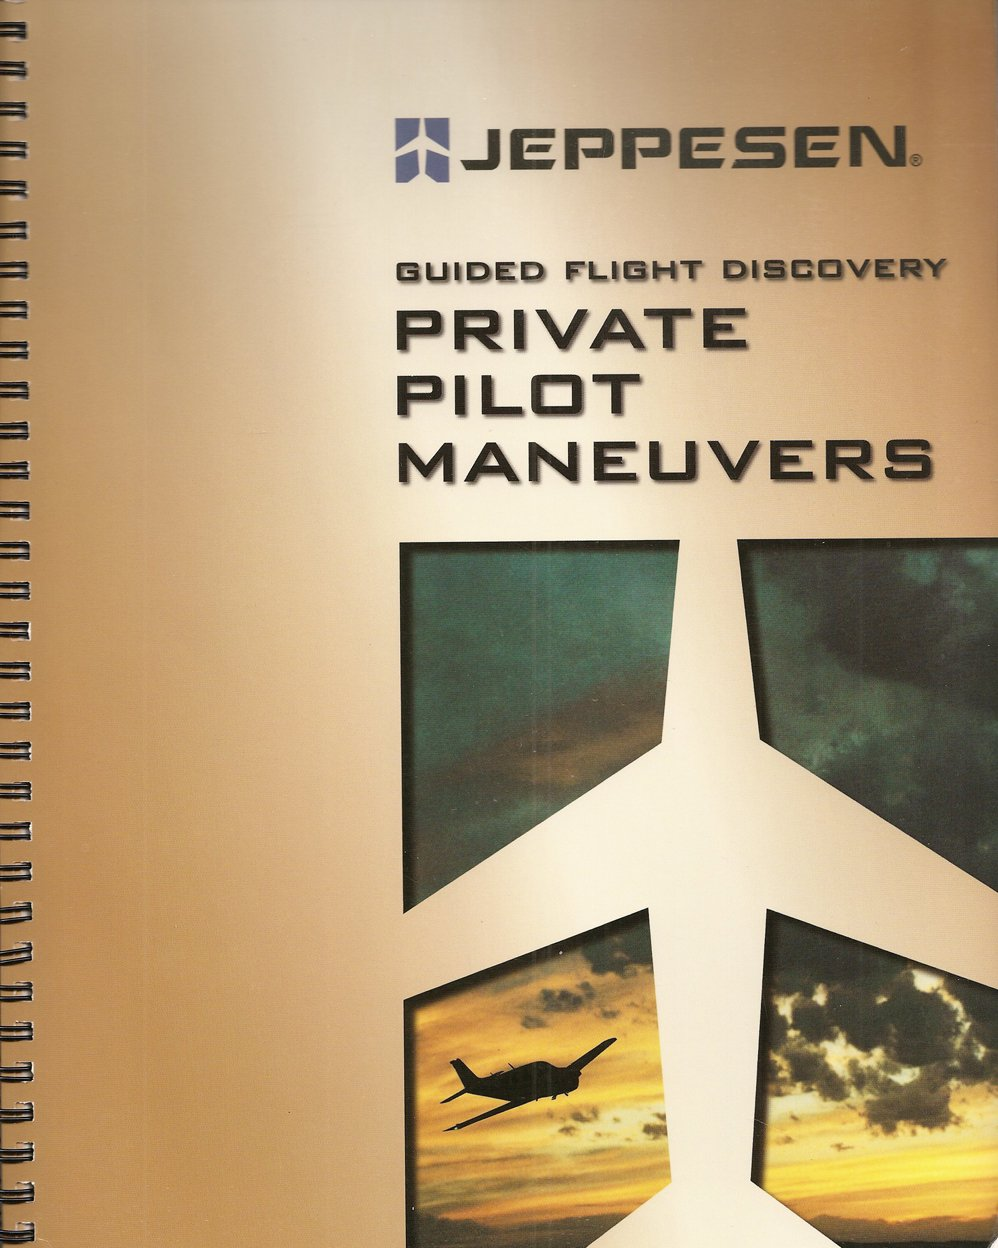 Jeppesen: Guided Flight Discovery: Private Pilot Maneuvers: Jeppesen:  9780884874355: Amazon.com: Books